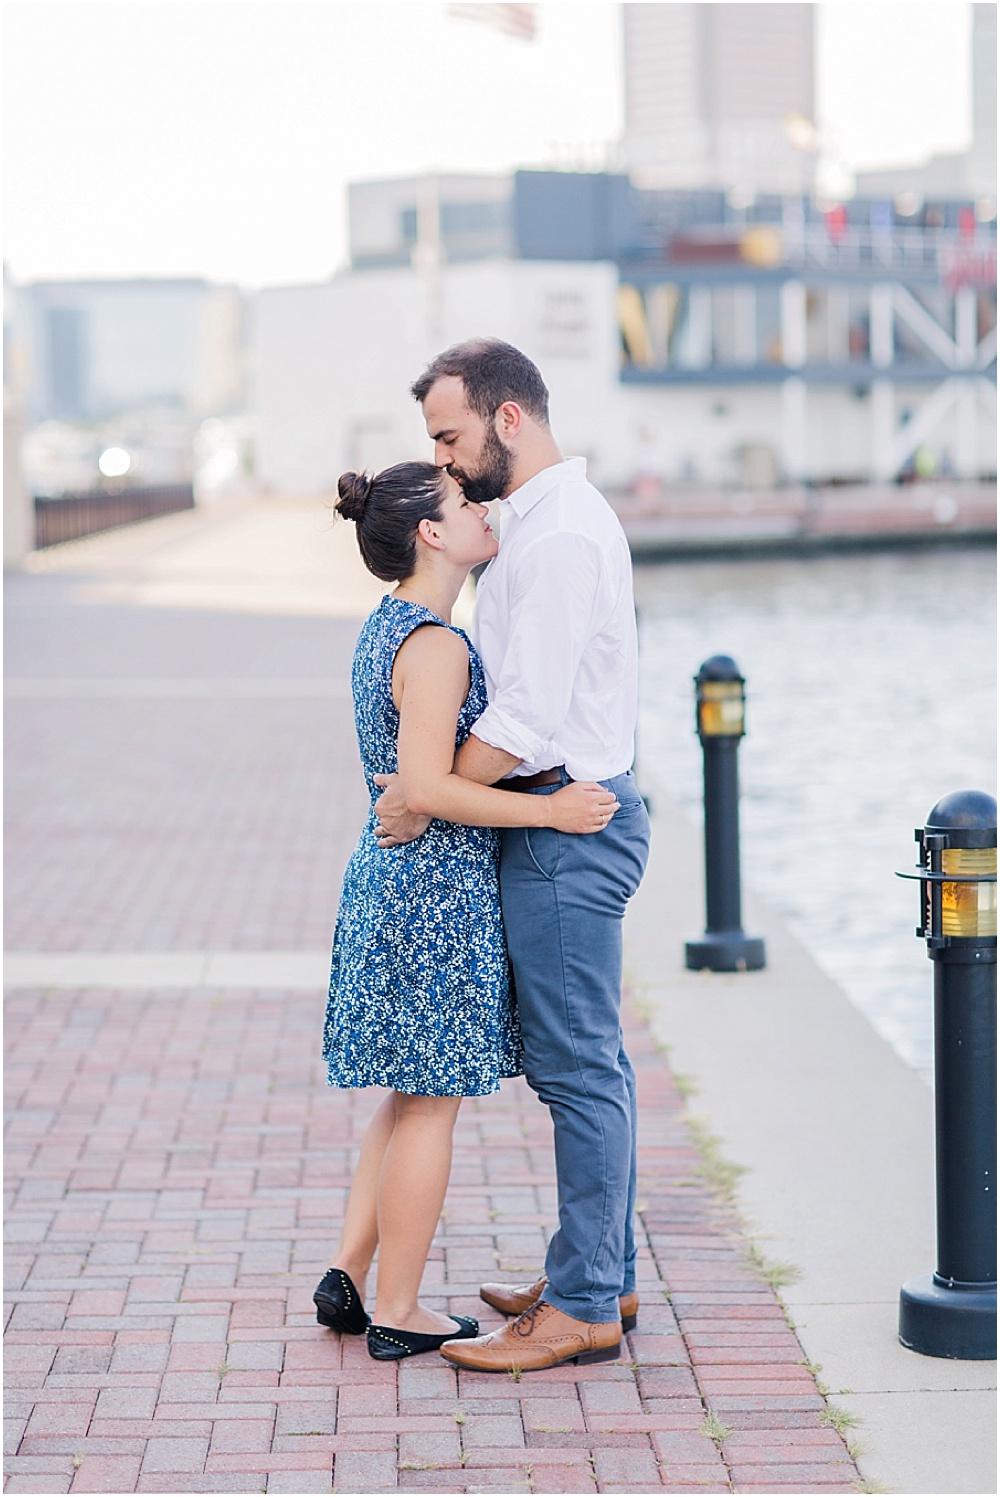 Liz_Robert_Federal_Hill_Engagement_Session_Baltimore_Wedding_Photographer_0001